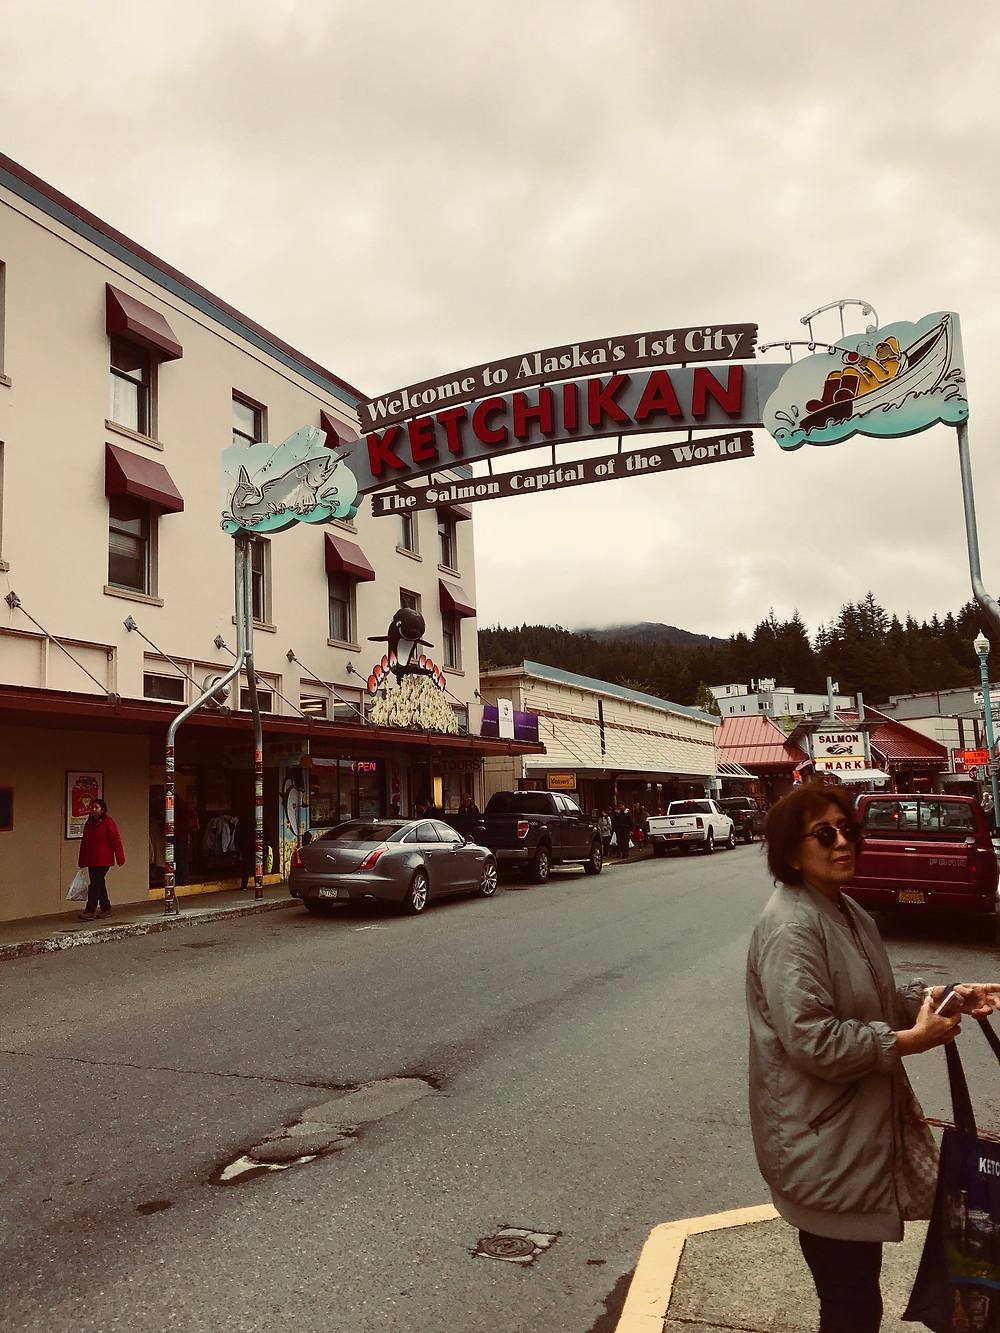 Ketchikan, Alaska's first city